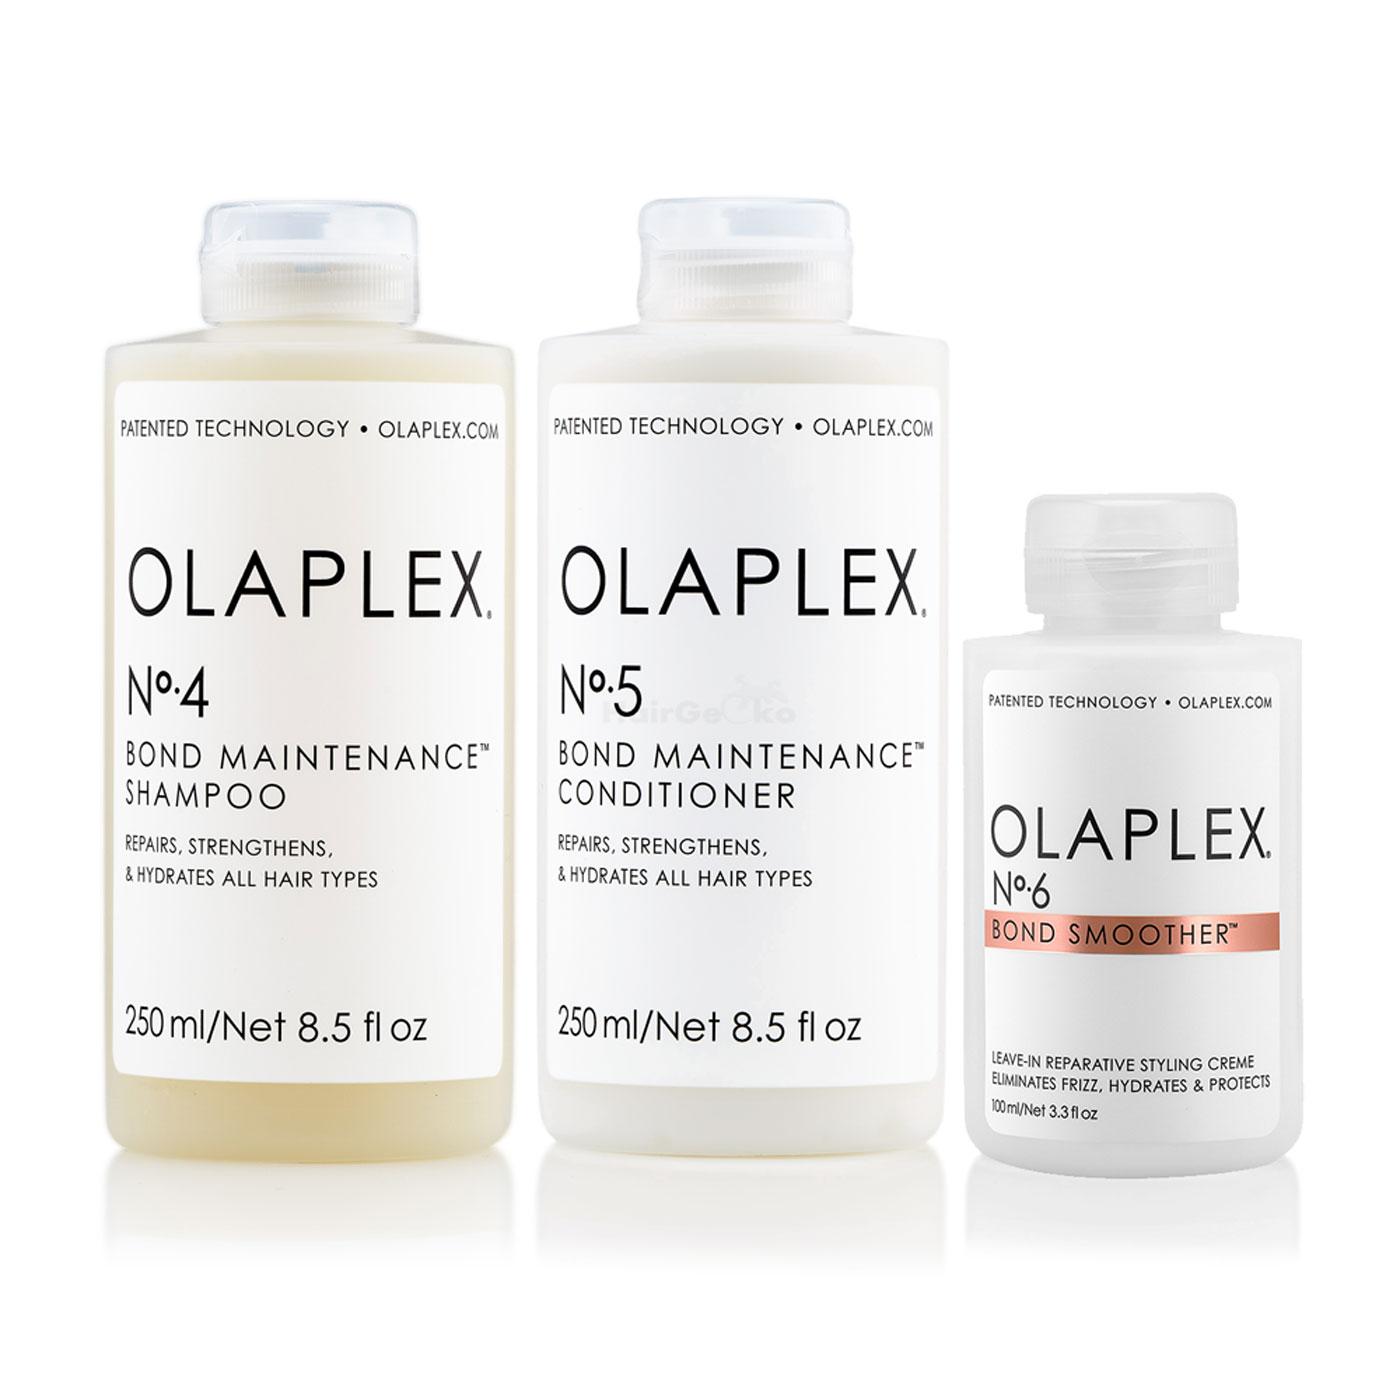 Olaplex Set - Olaplex Bond Maintenance Shampoo No 4 (250ml) + Olaplex Bond Maintenance Conditioner No 5 (250ml) + Olaplex Bond Smoother No 6 (100ml)